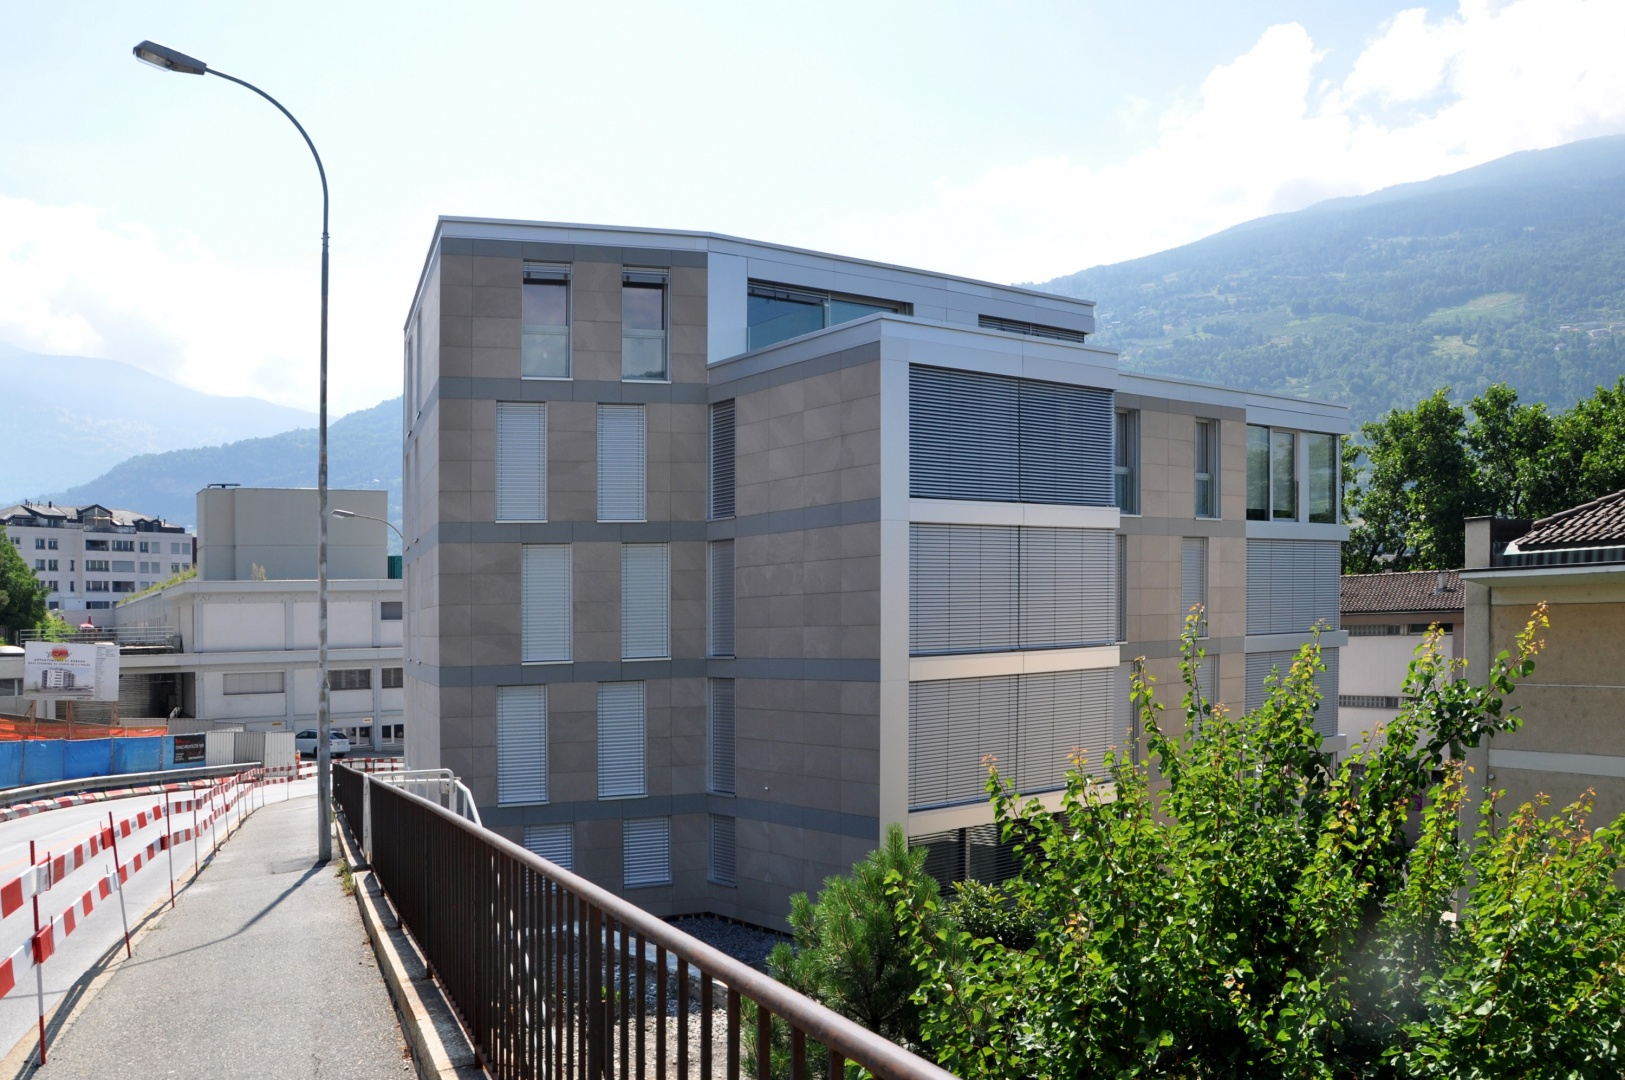 Nordwest-Ansicht © Savioz & Di Berardino architectes